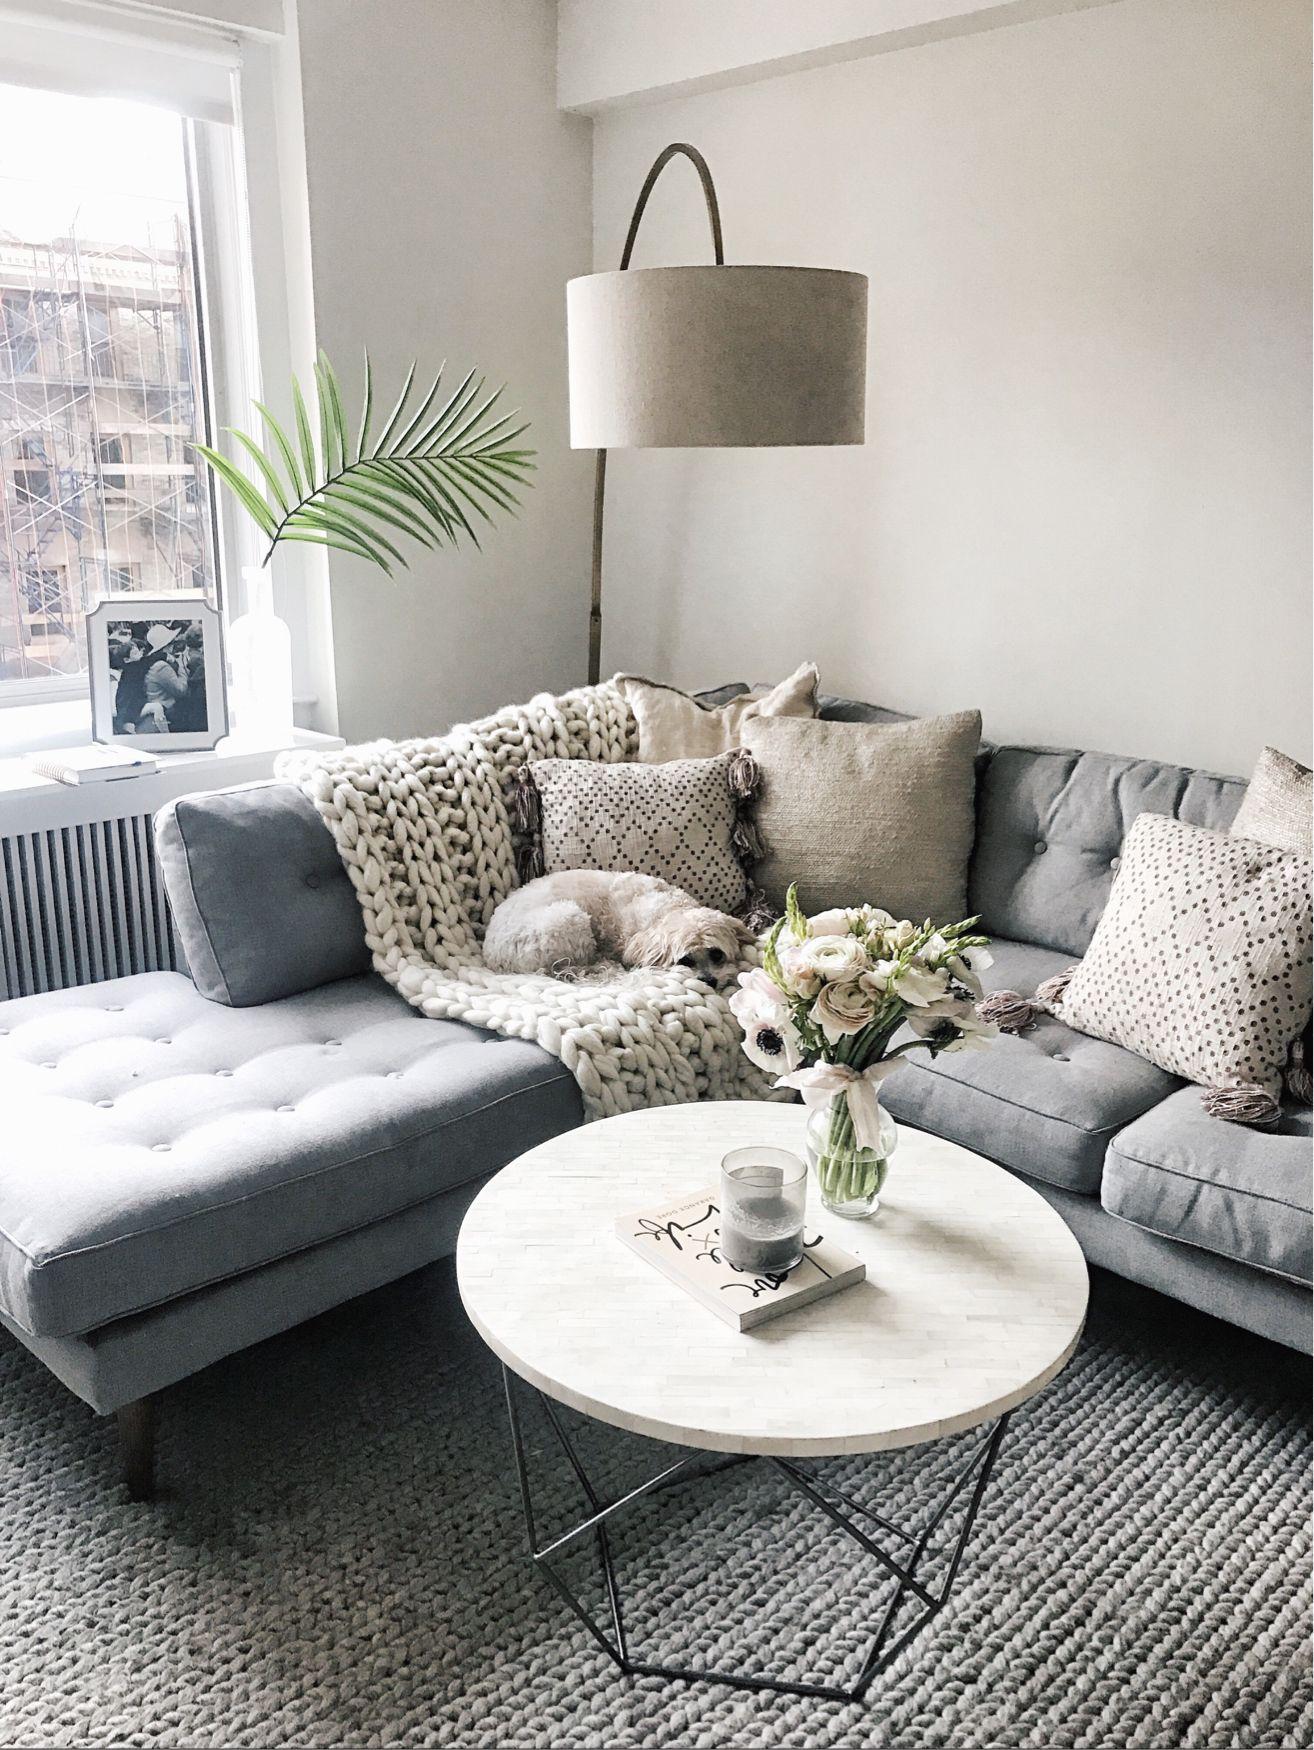 pinterest small living room Pin by Brooke Jacobsen Lessinger on Decorating | Home décor, Living Room, Living room modern